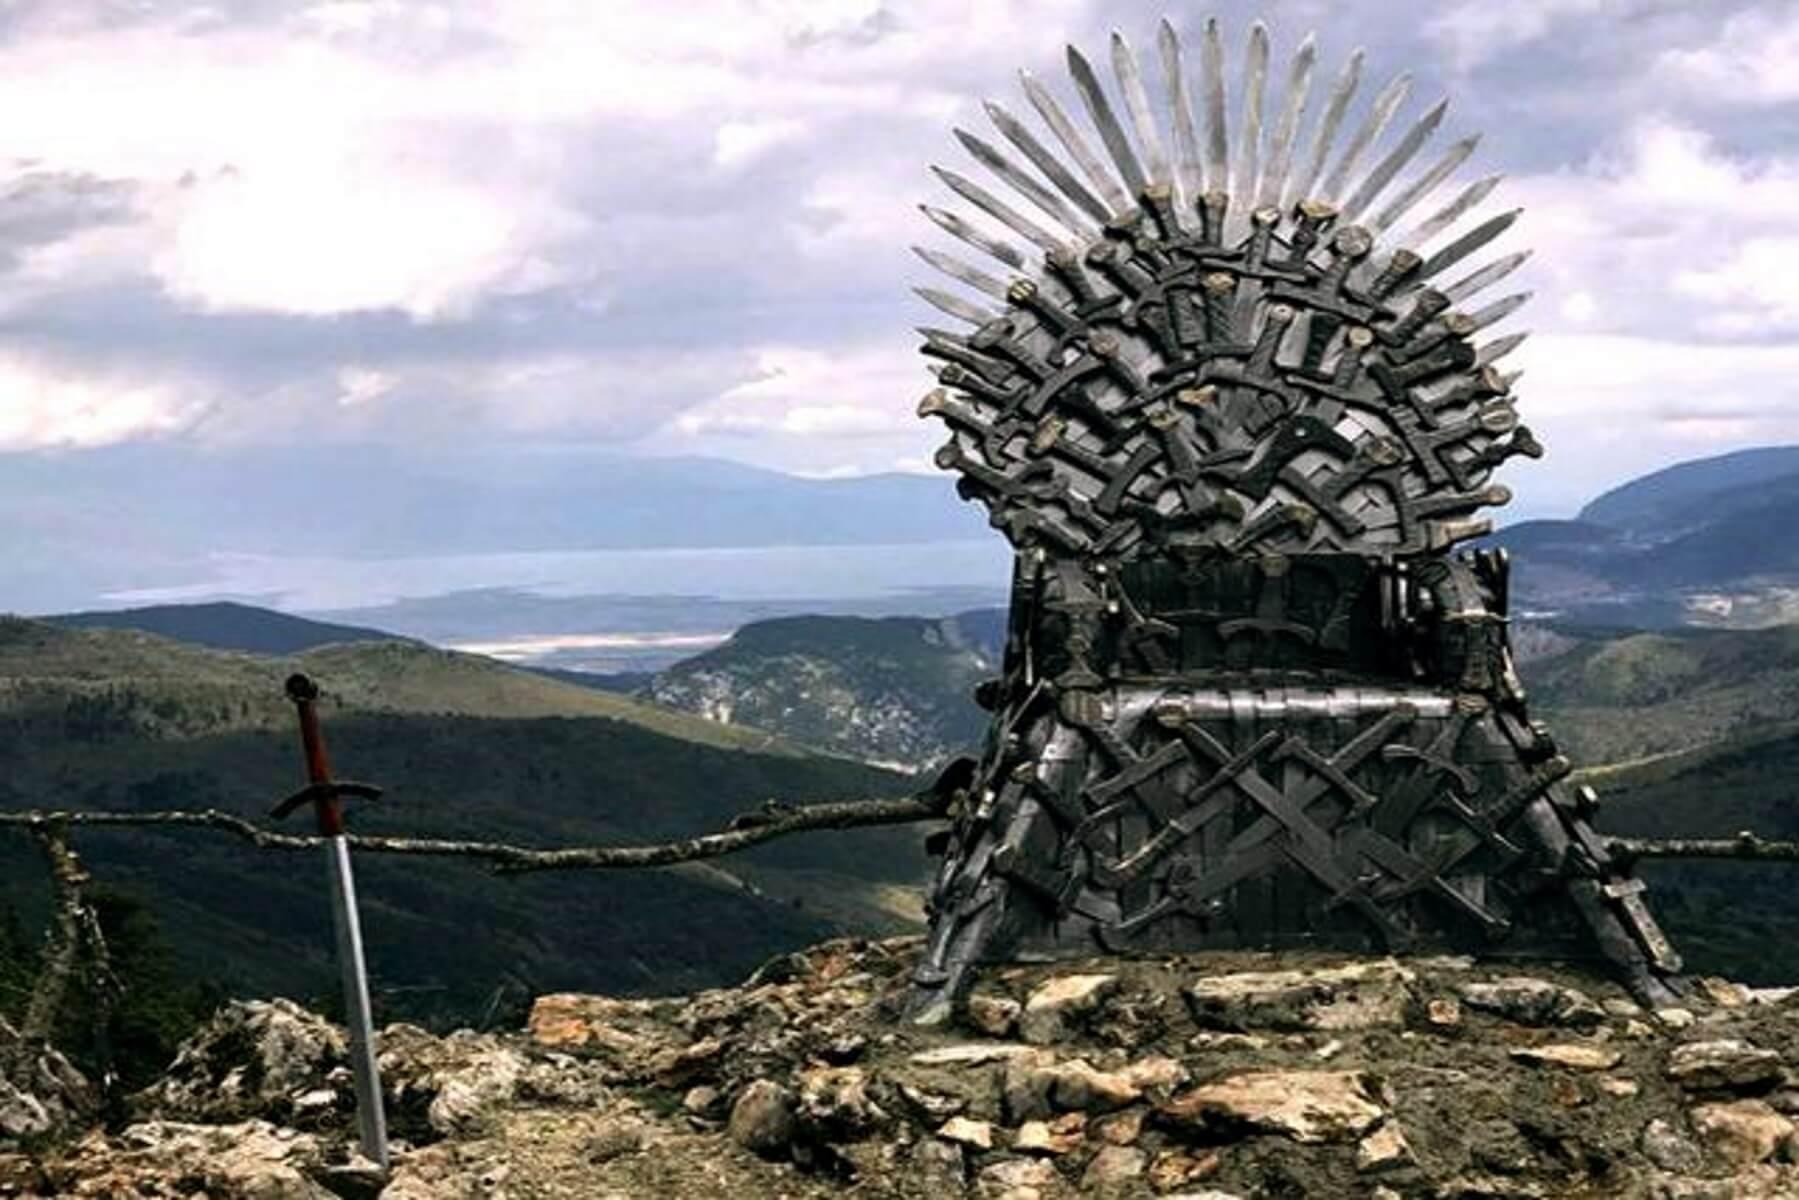 Game of Thrones: Ο σιδερένιος θρόνος τοποθετήθηκε… στην Παύλιανη! [pics]